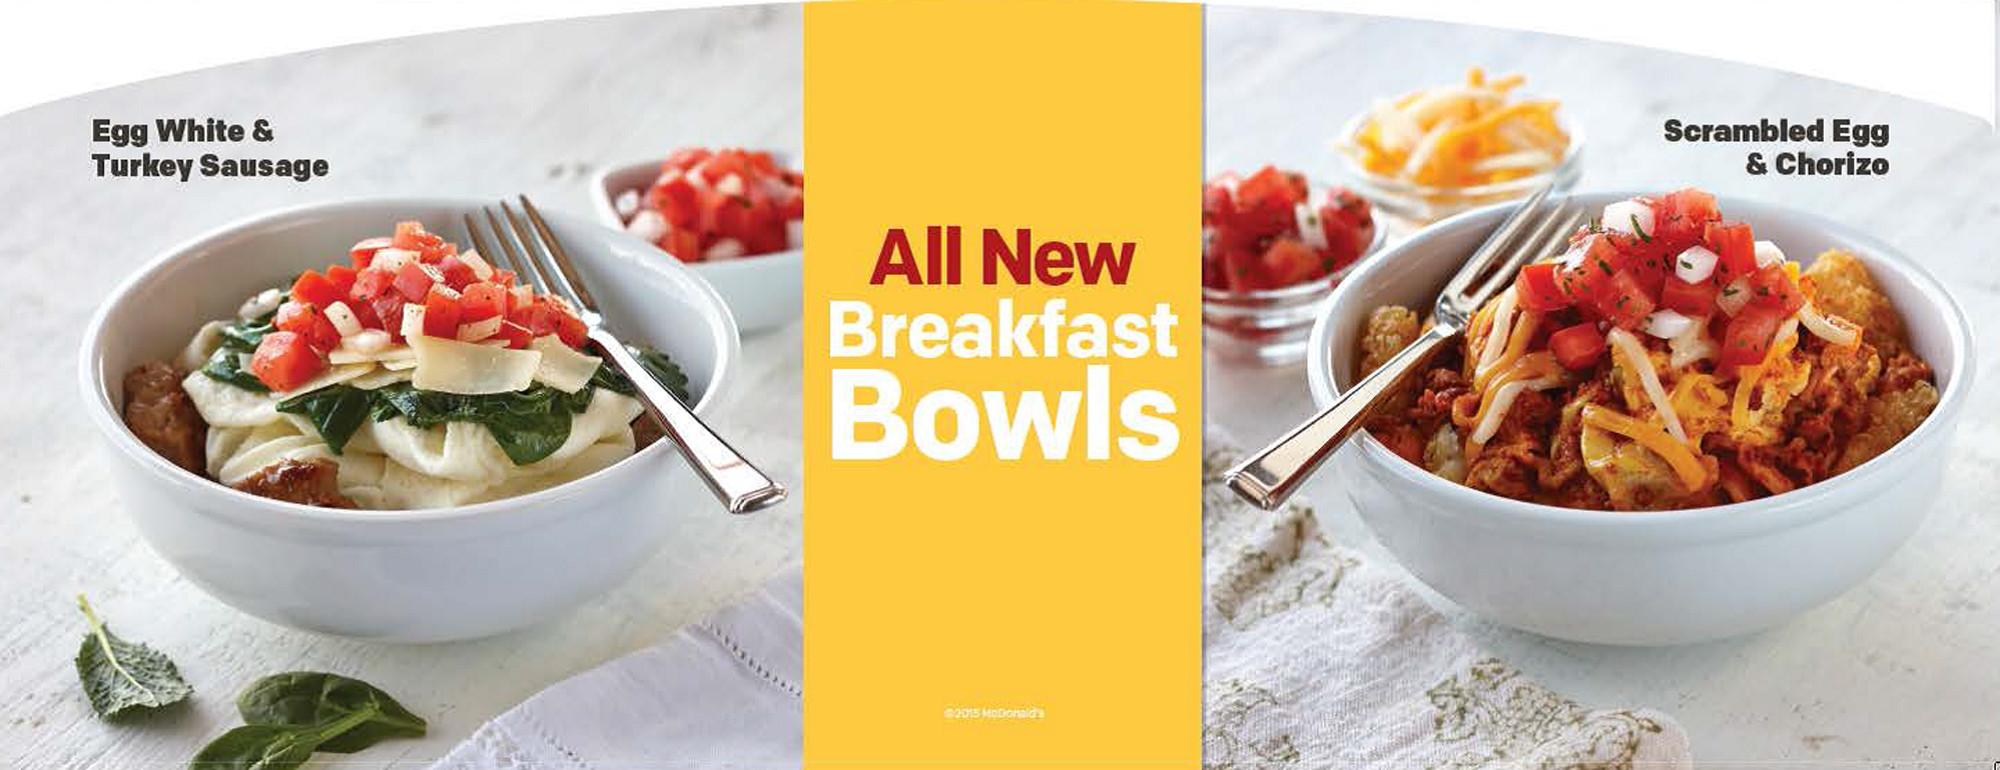 Mcdonalds Healthy Breakfast Menu  McDonald s adding new ingre nt kale HT Health